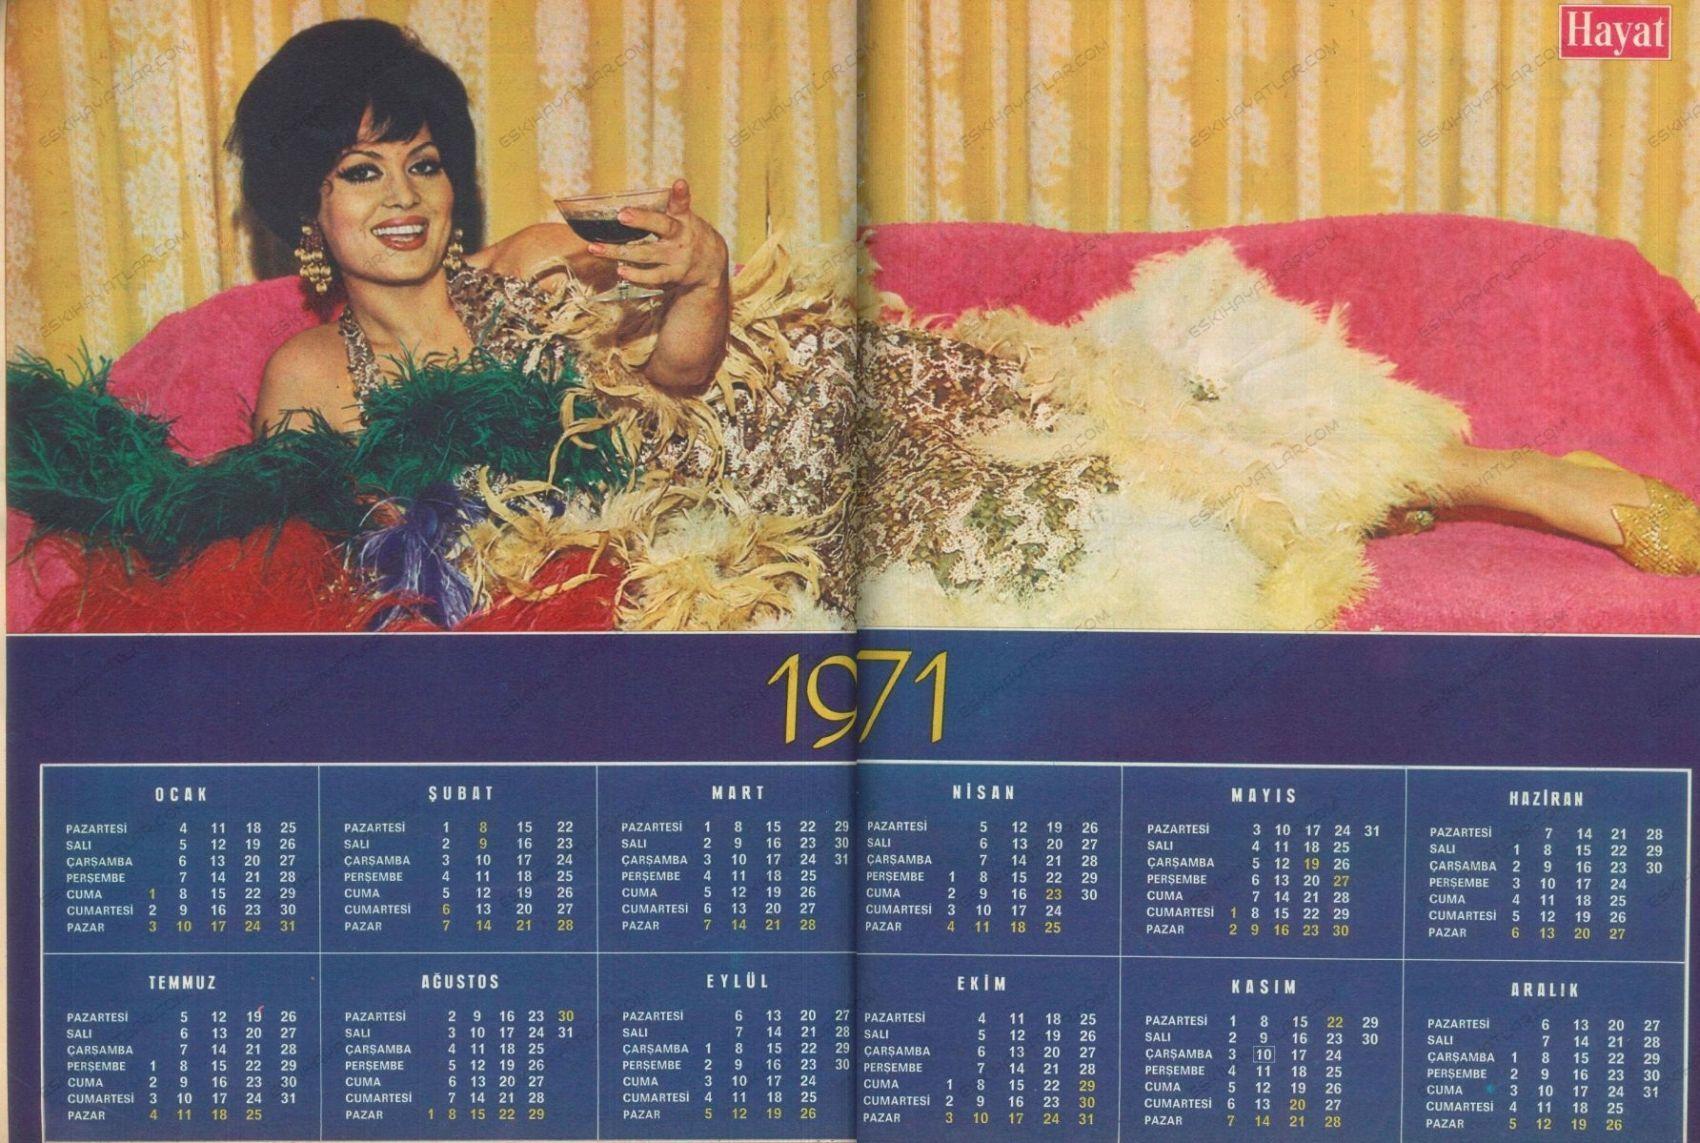 0181-turkan-soray-1971-takvimi-hayat-dergisi-1